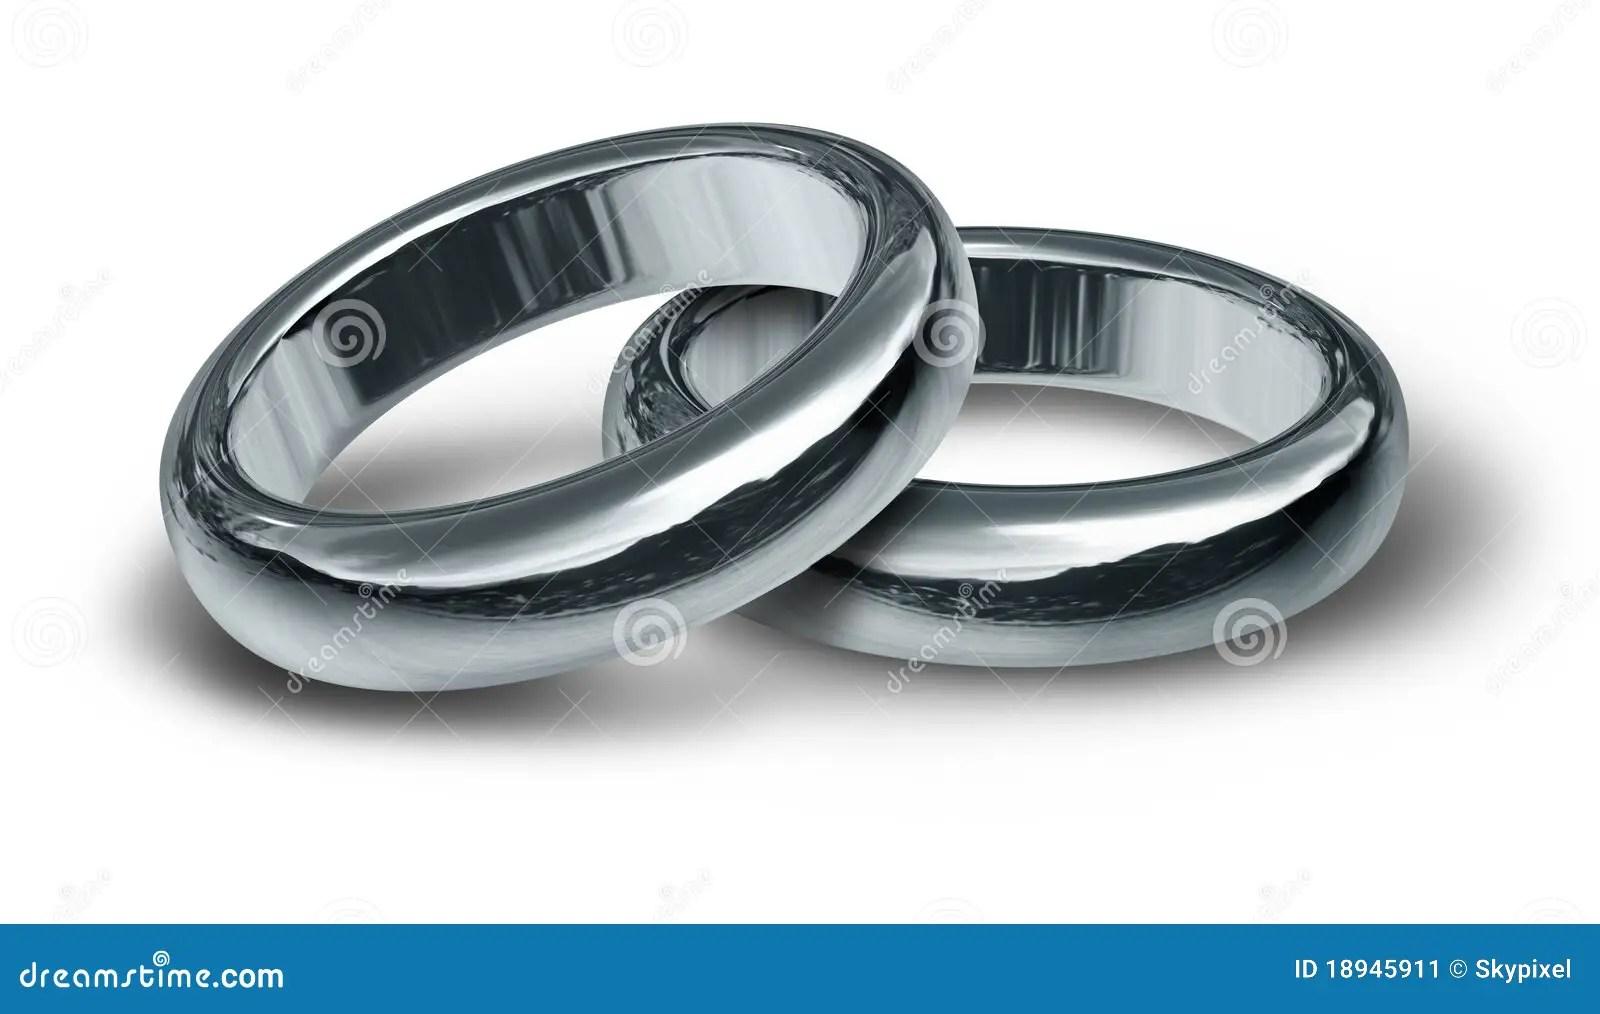 stock image titanium silver wedding rings symbol image silver wedding rings Titanium and silver wedding rings symbol